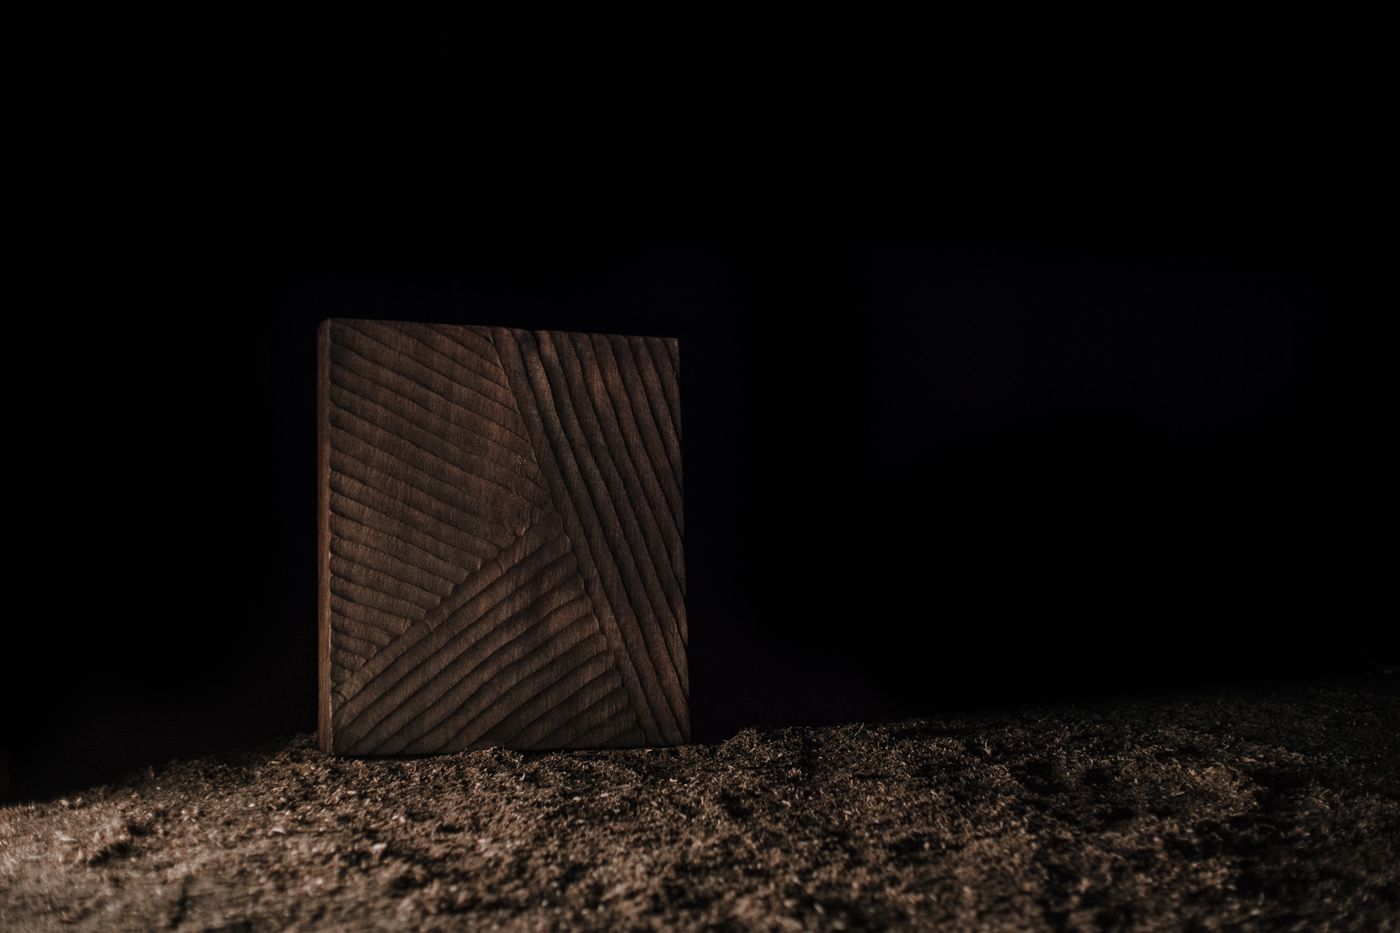 #wood, #panel, #decor, #chainsaw, #Russia, #soha, #art, #Denis #Milovanov, #handmade